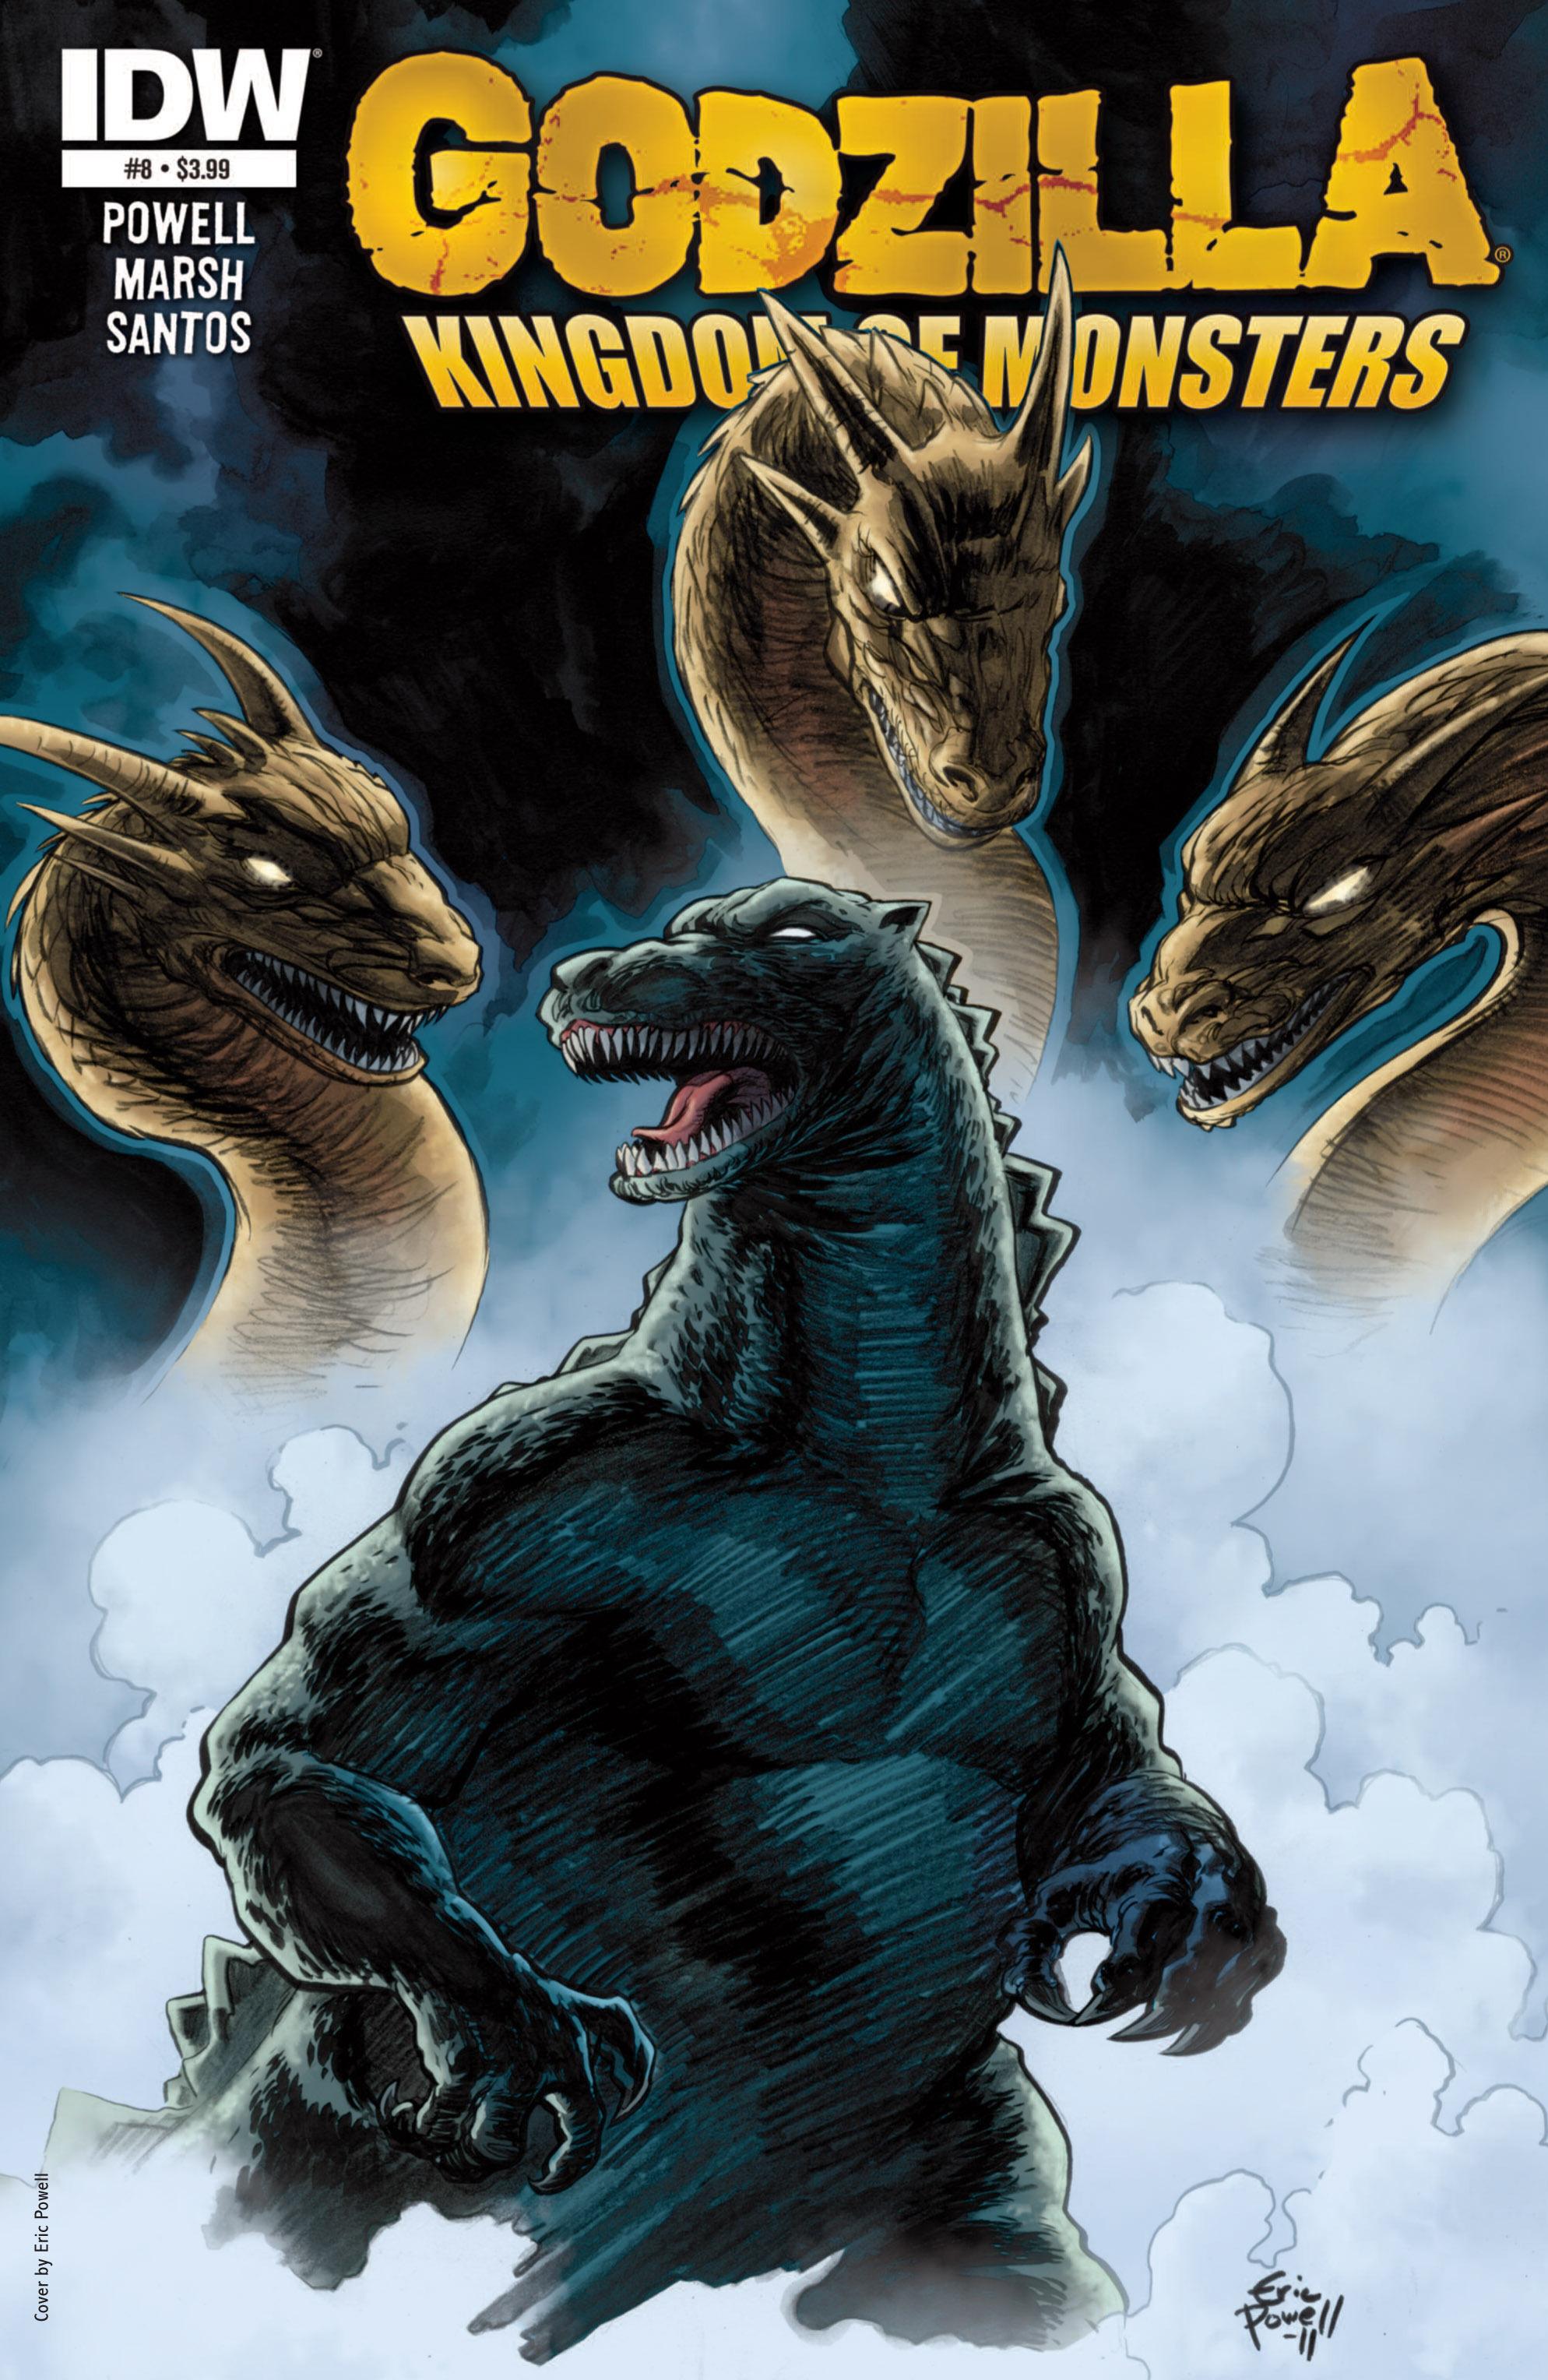 Godzilla: Kingdom of Monsters 8 Page 1